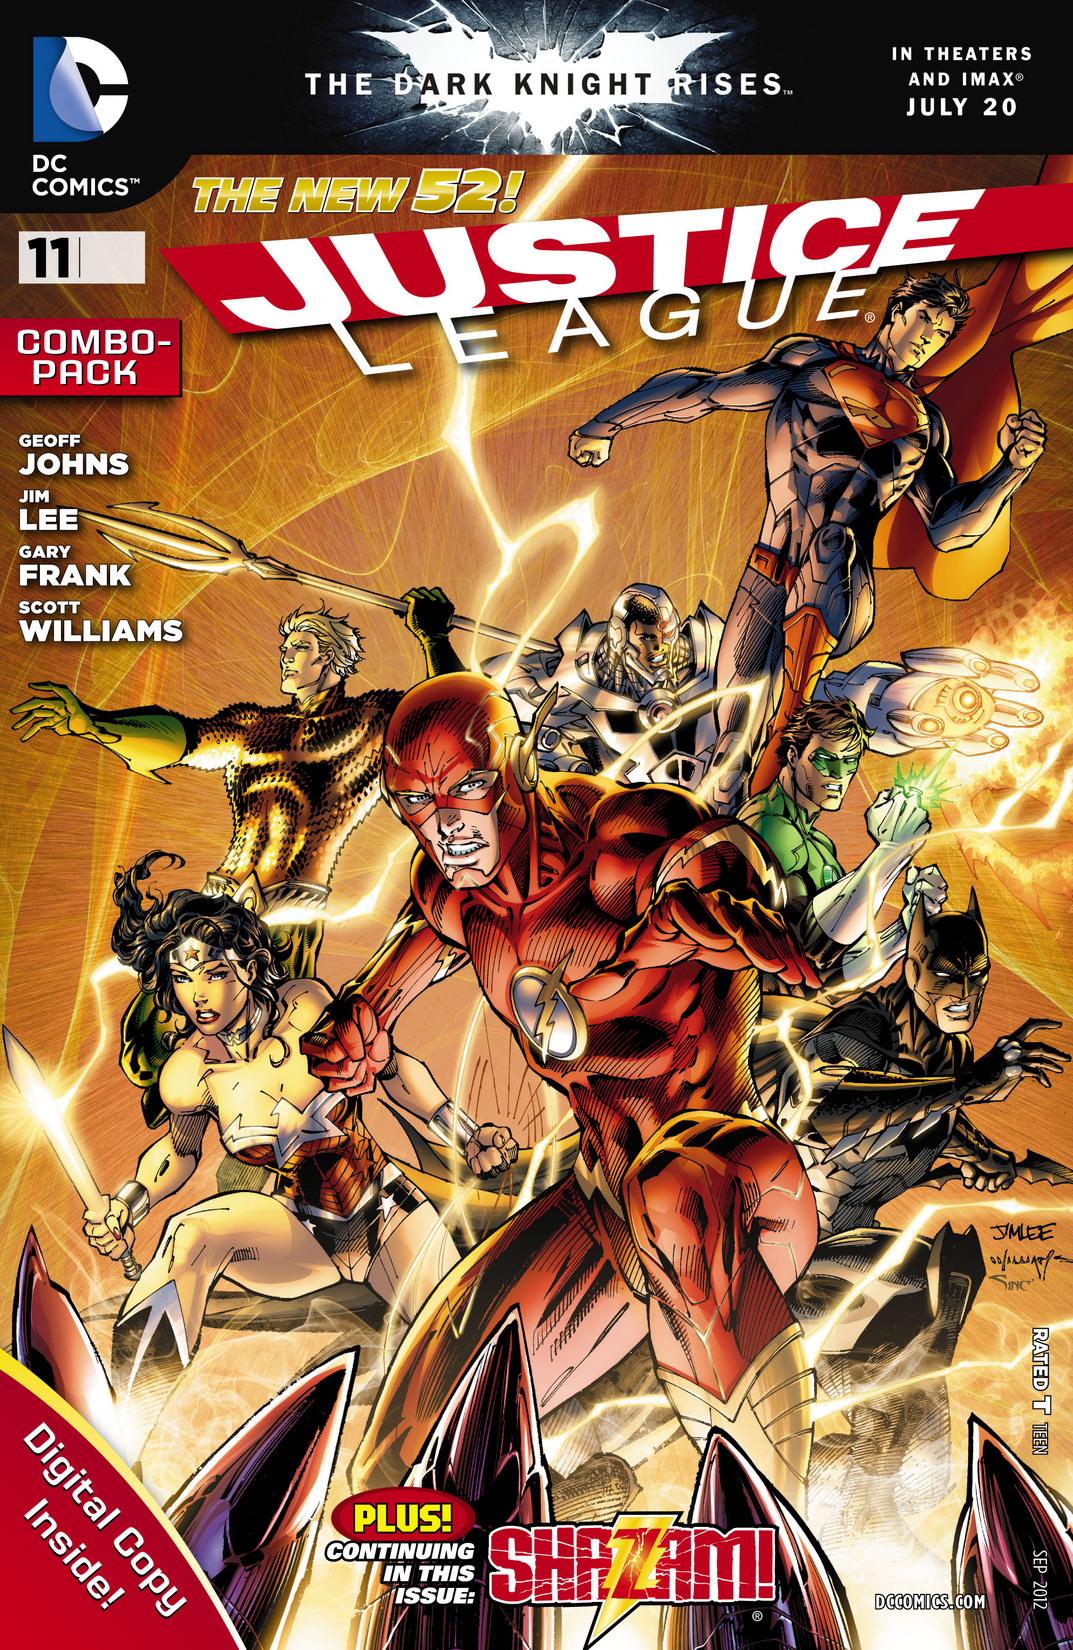 Justice League Vol 2 11 Combo.jpg